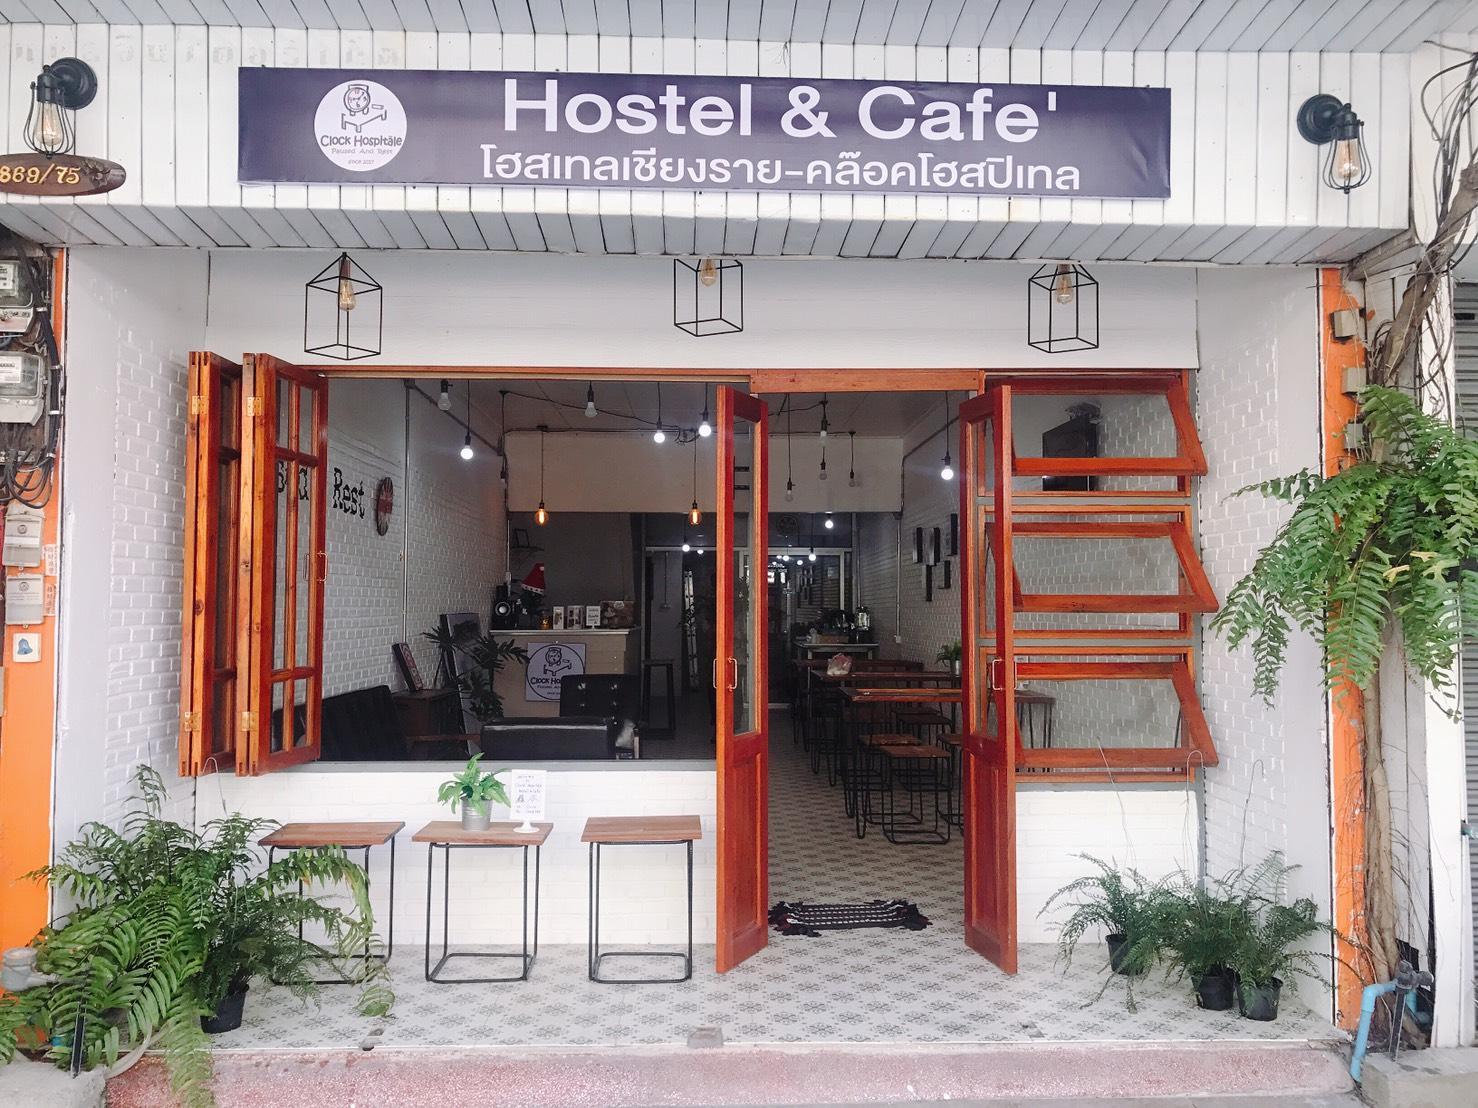 Hostel Chiangrai Clock Hospitale